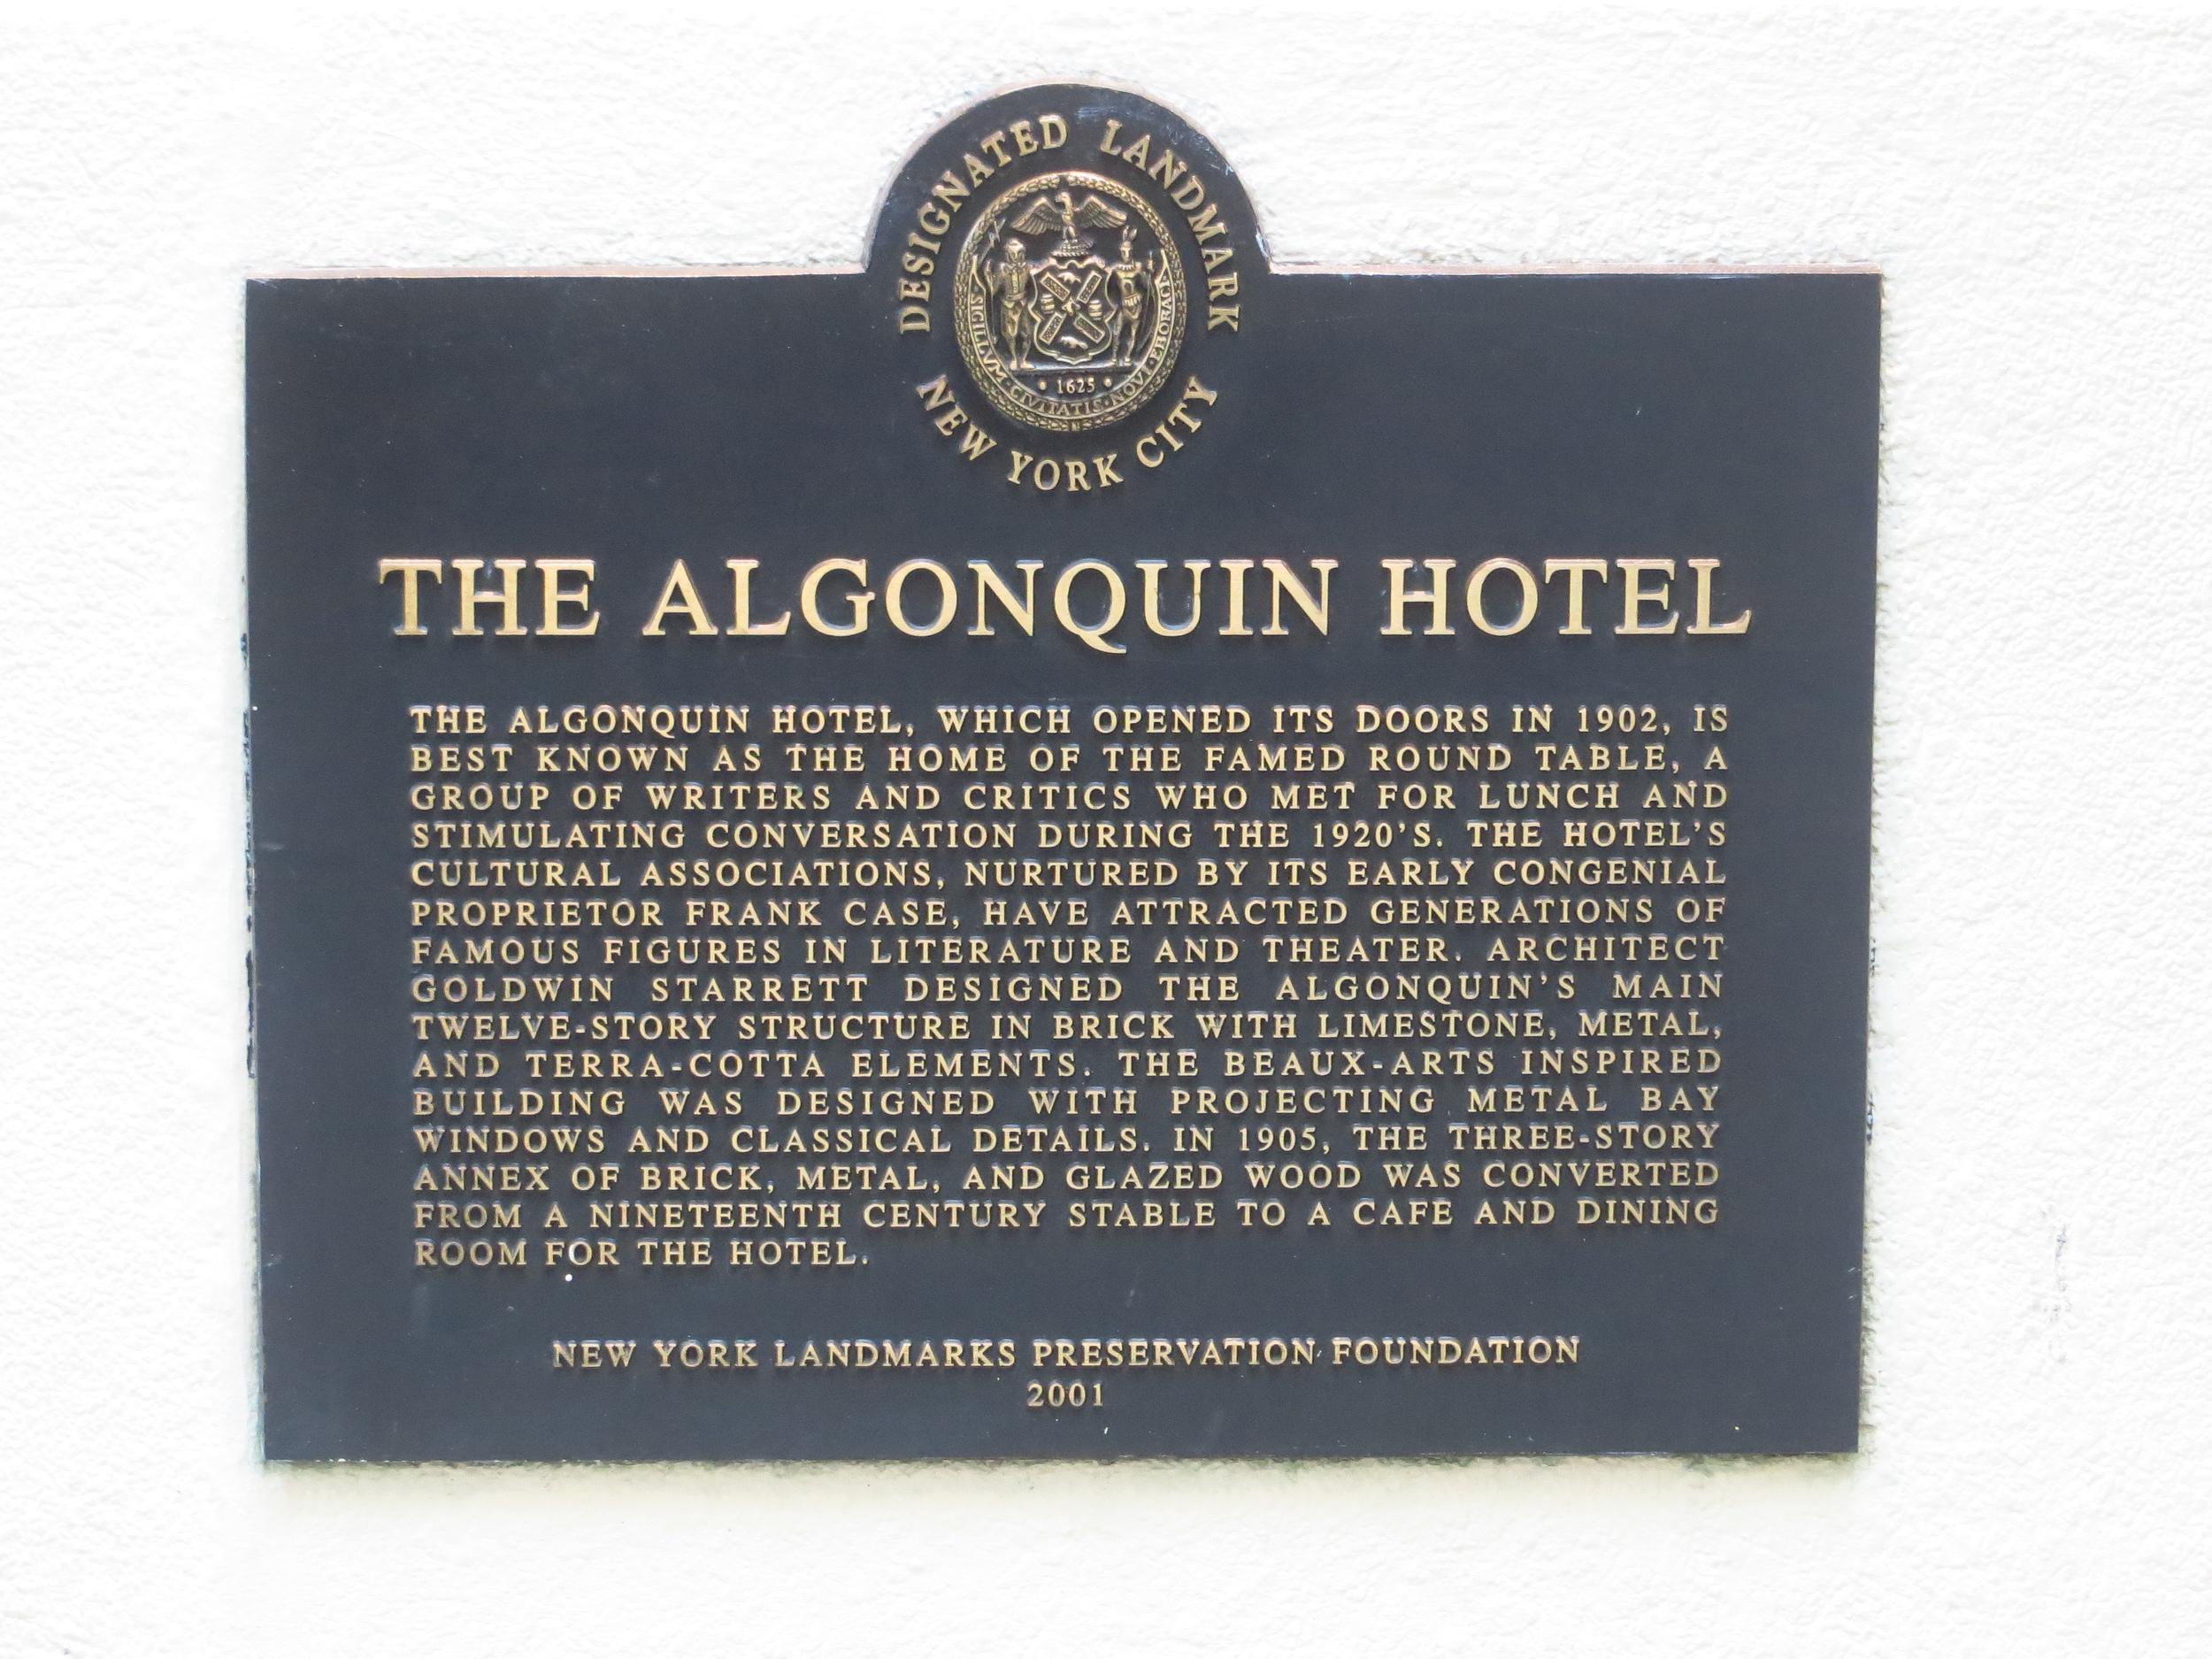 Algonquin Hotel history pt. I